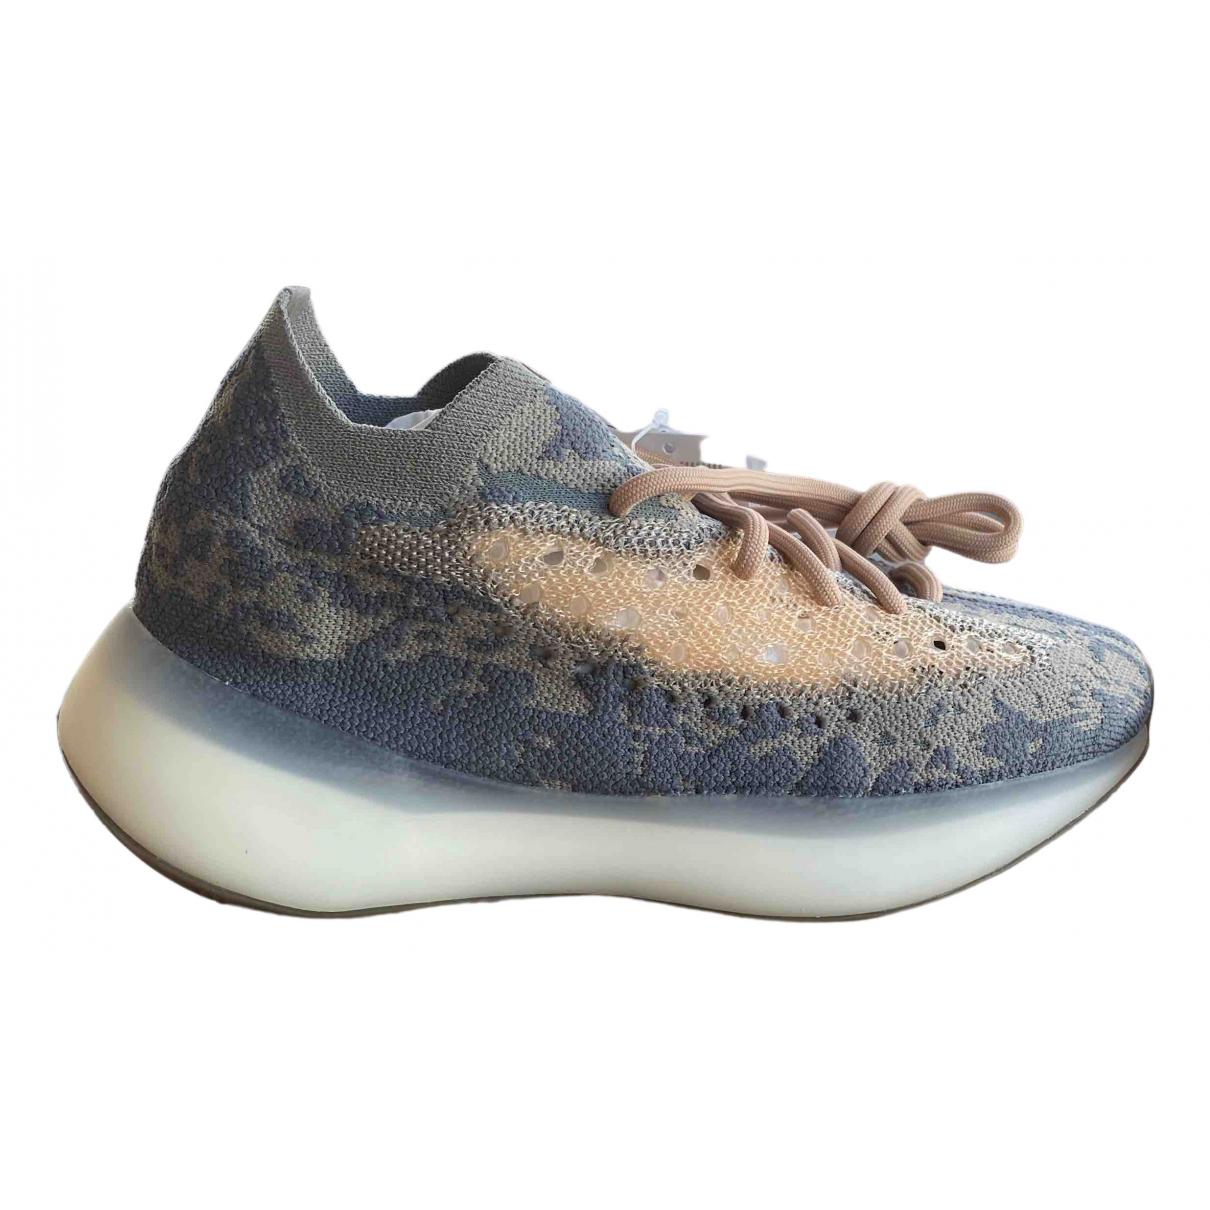 Yeezy X Adidas - Baskets Boost 380 pour femme en toile - beige